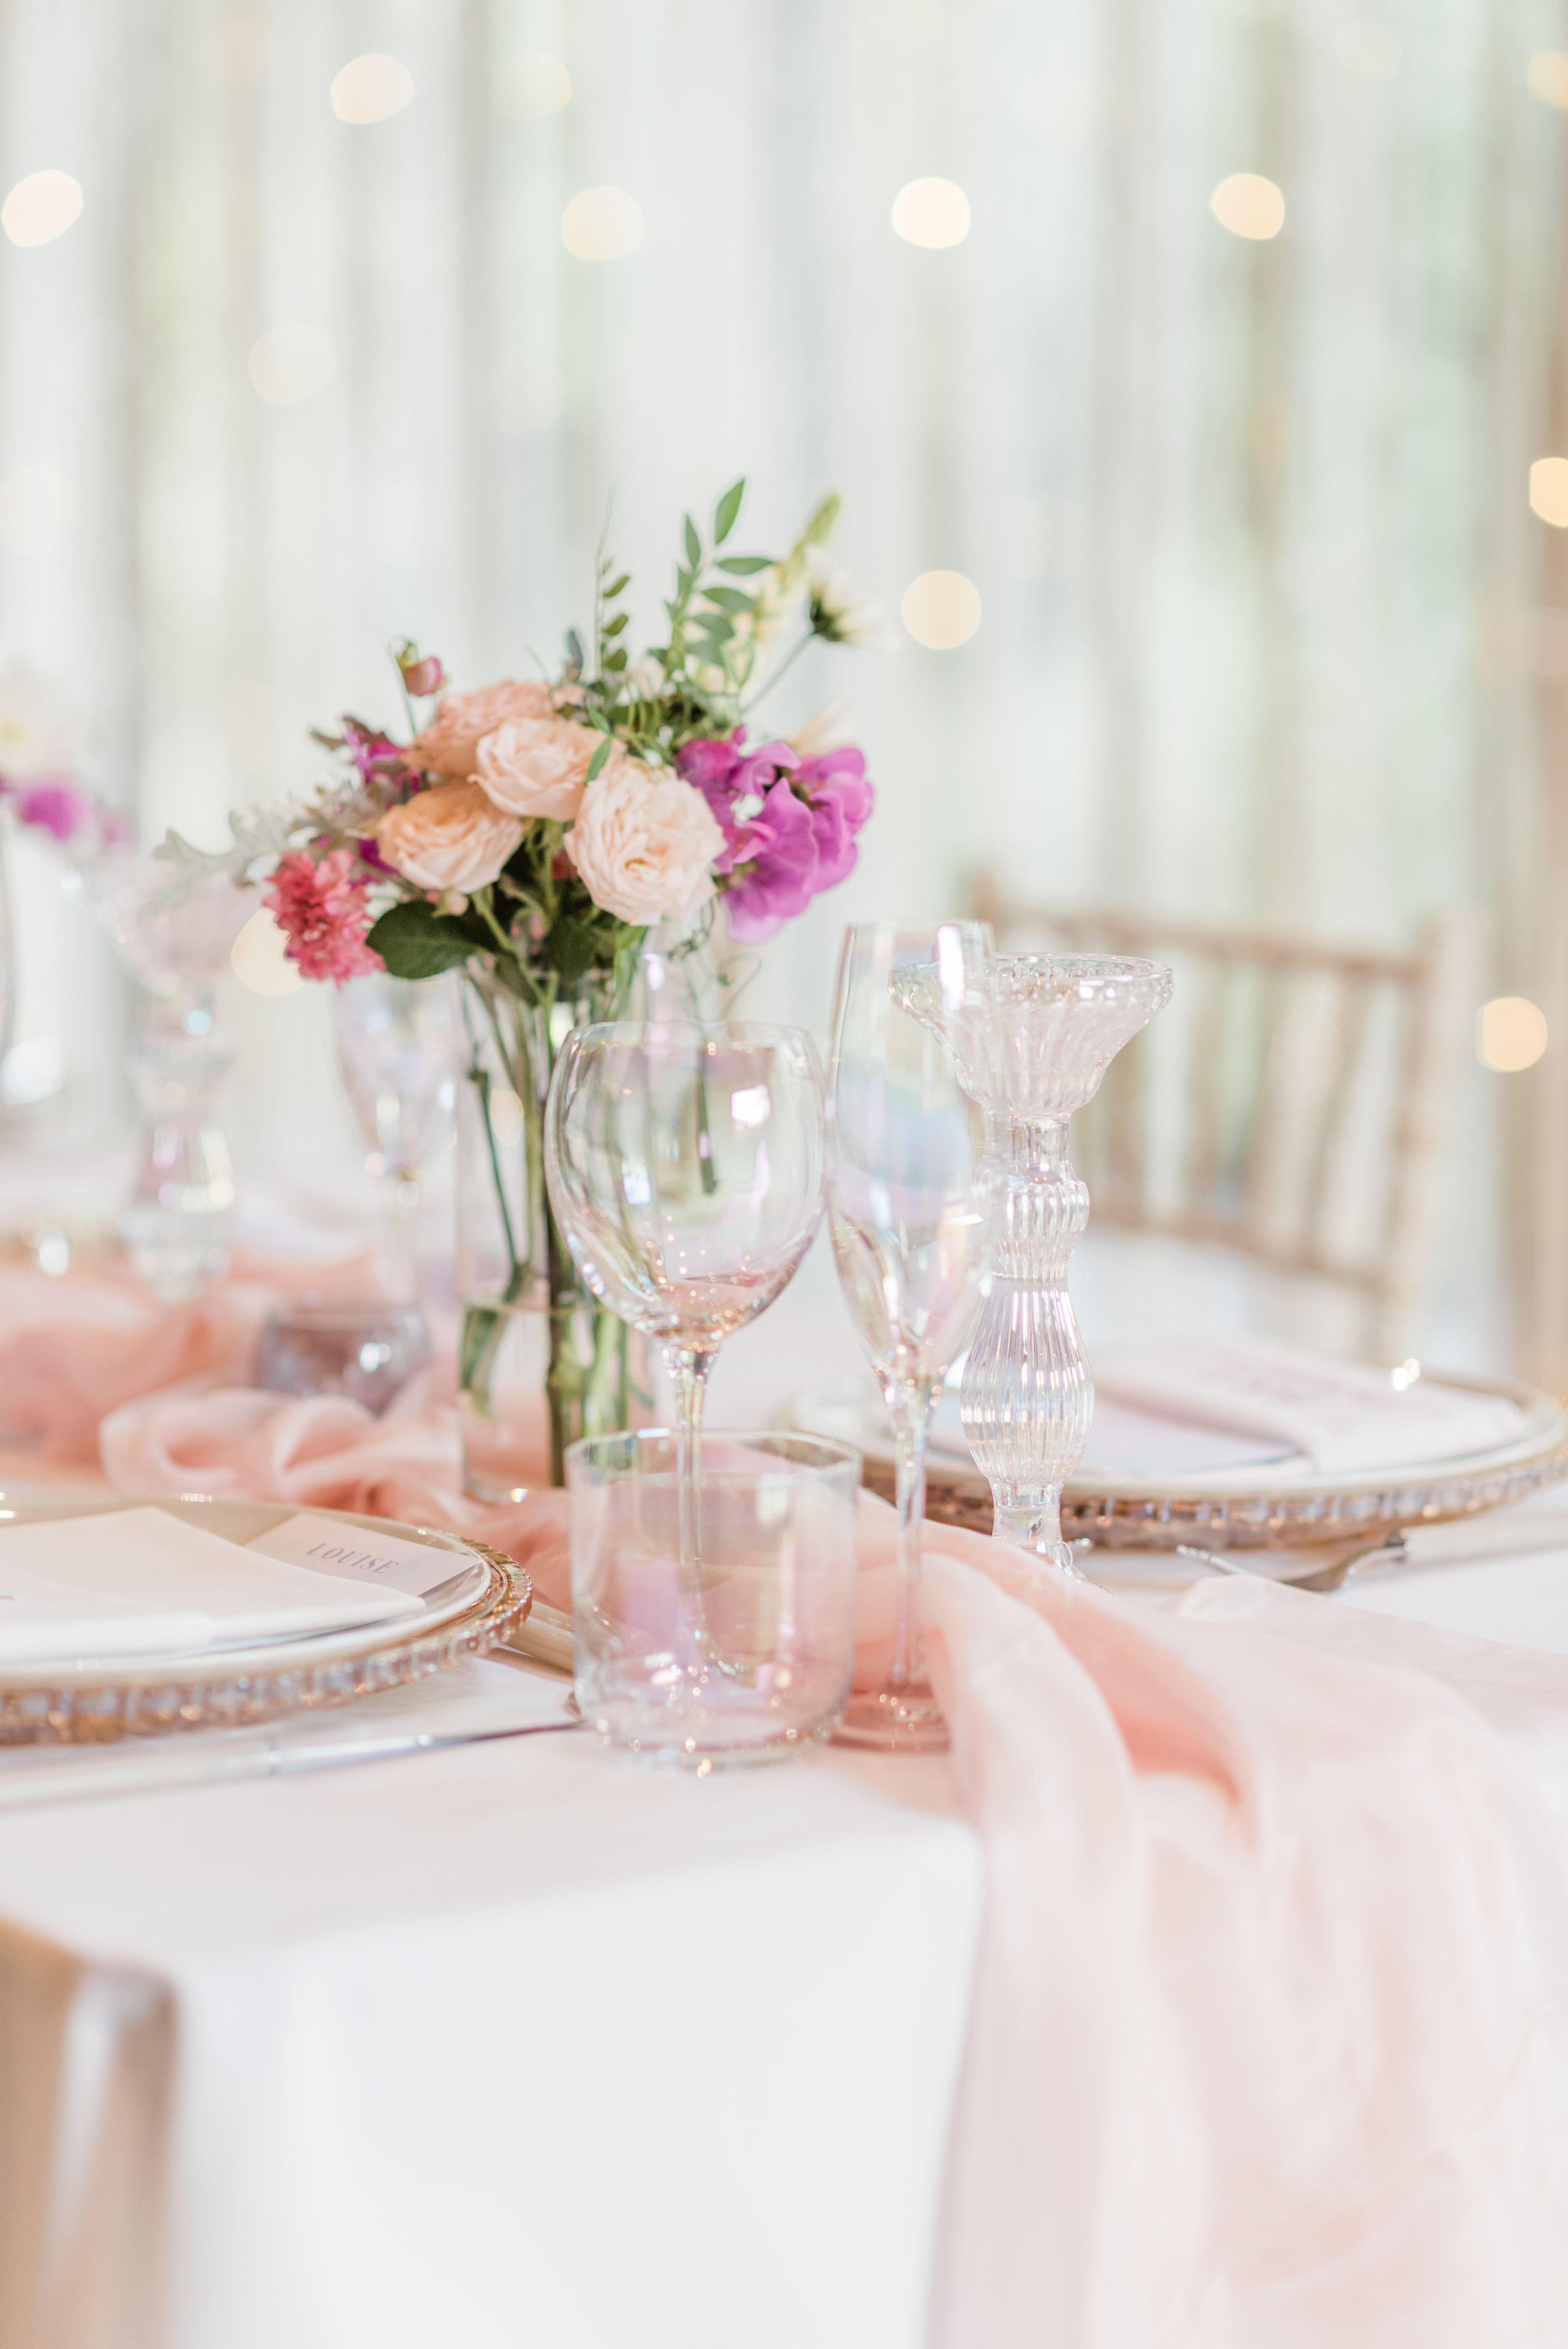 Luminescent Glassware Soft Pastel Wedding Details Pastel Wedding Table Decor Blush Pink Table Runner Unicorn Wedding Wedding Shoot Magical Wedding